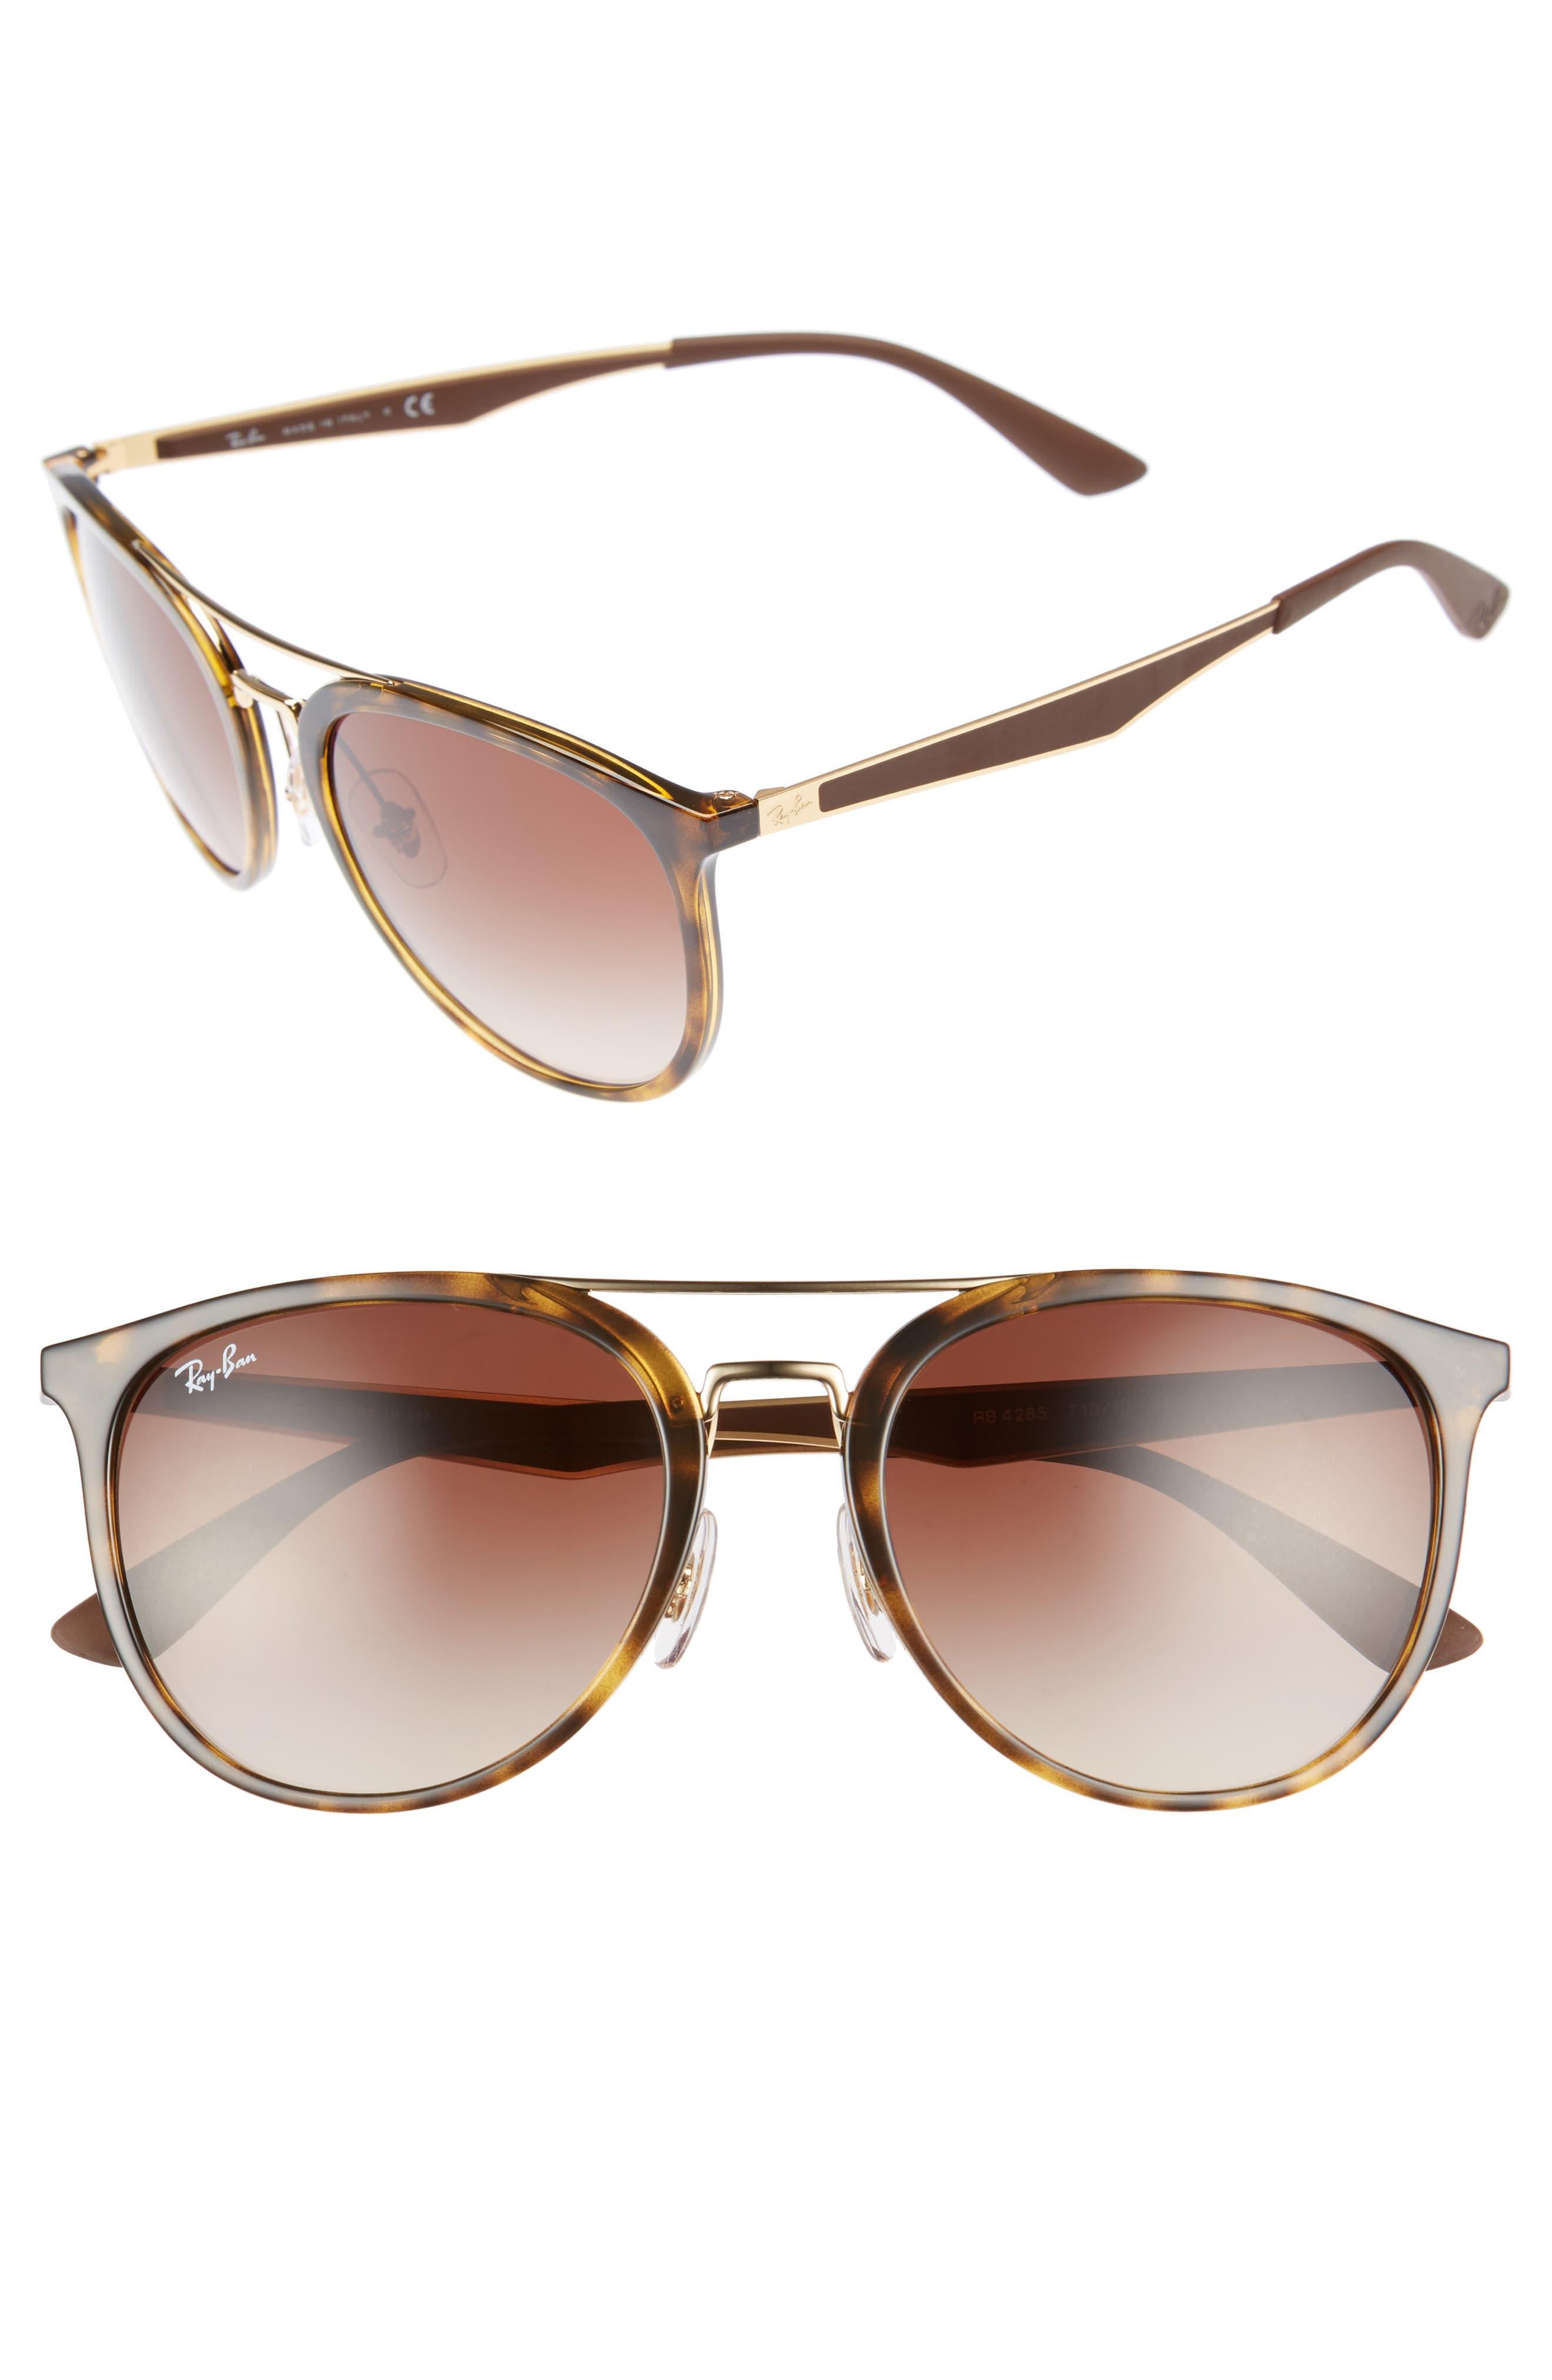 55mm Retro Sunglasses,                         Main,                         color, Light Tortoise